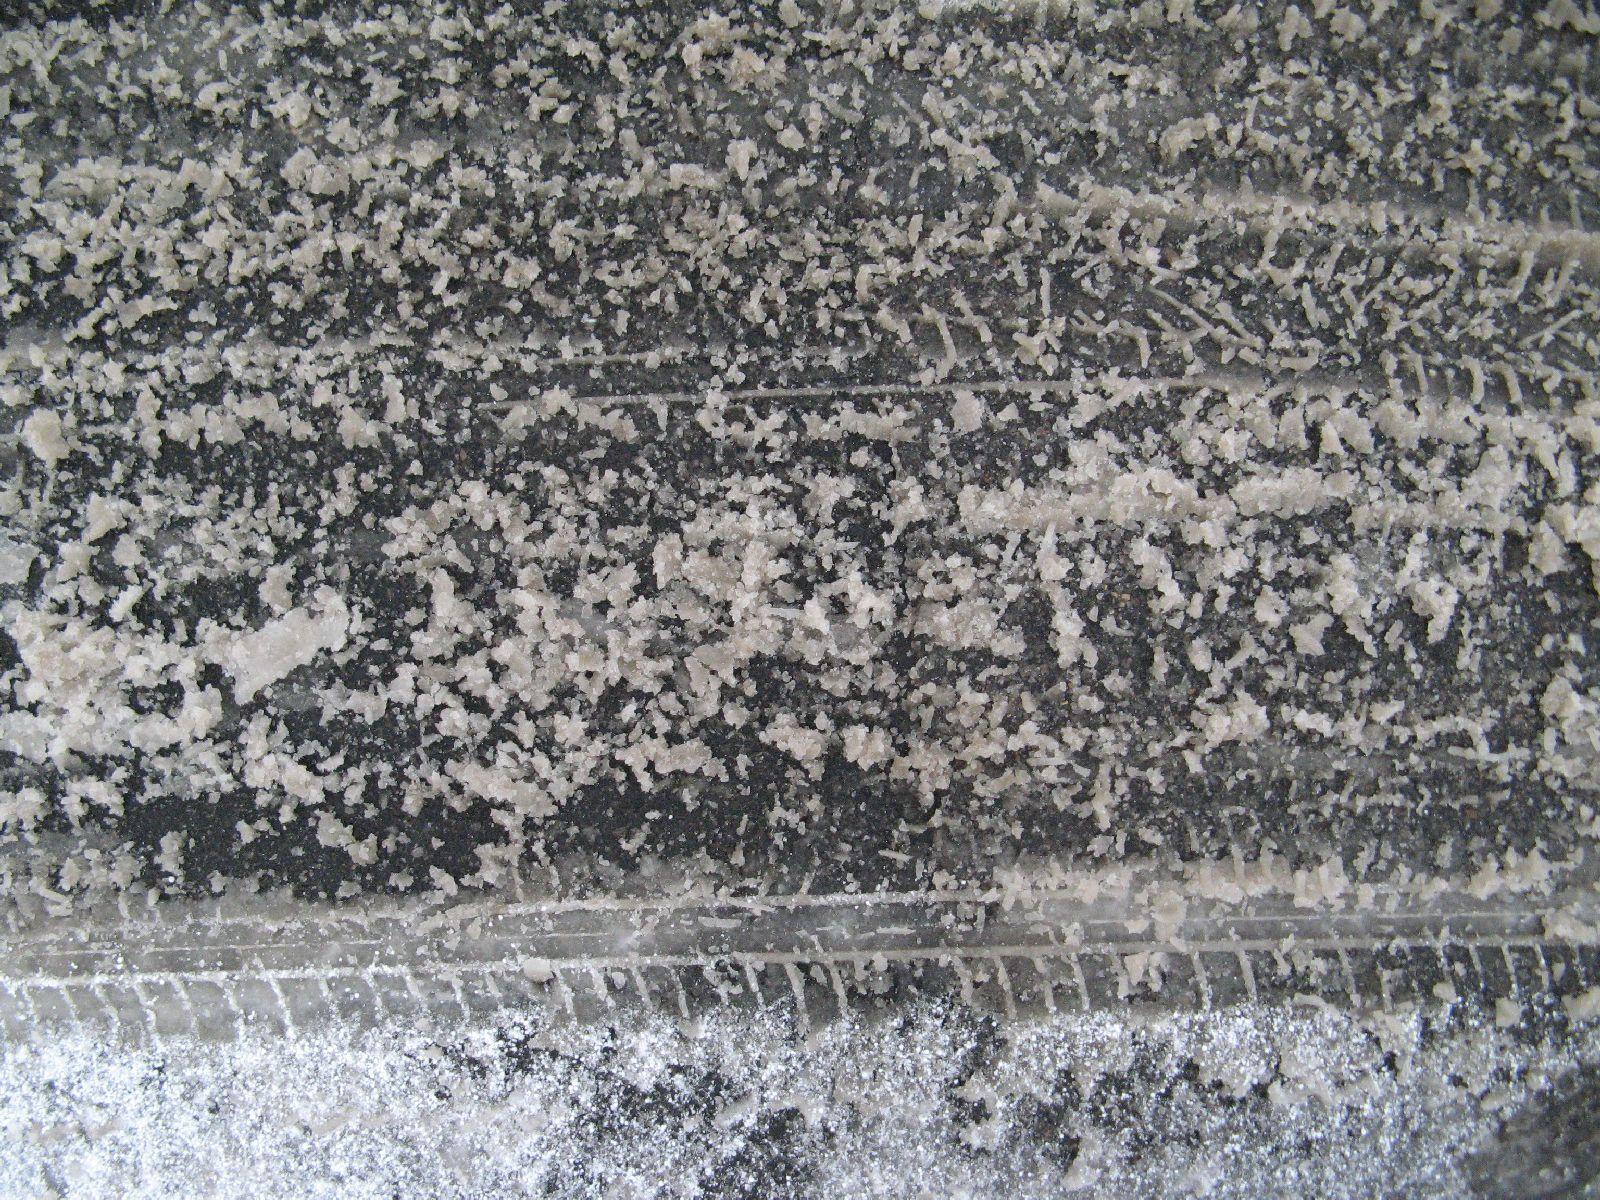 Schnee-Eis_Textur_B_5833